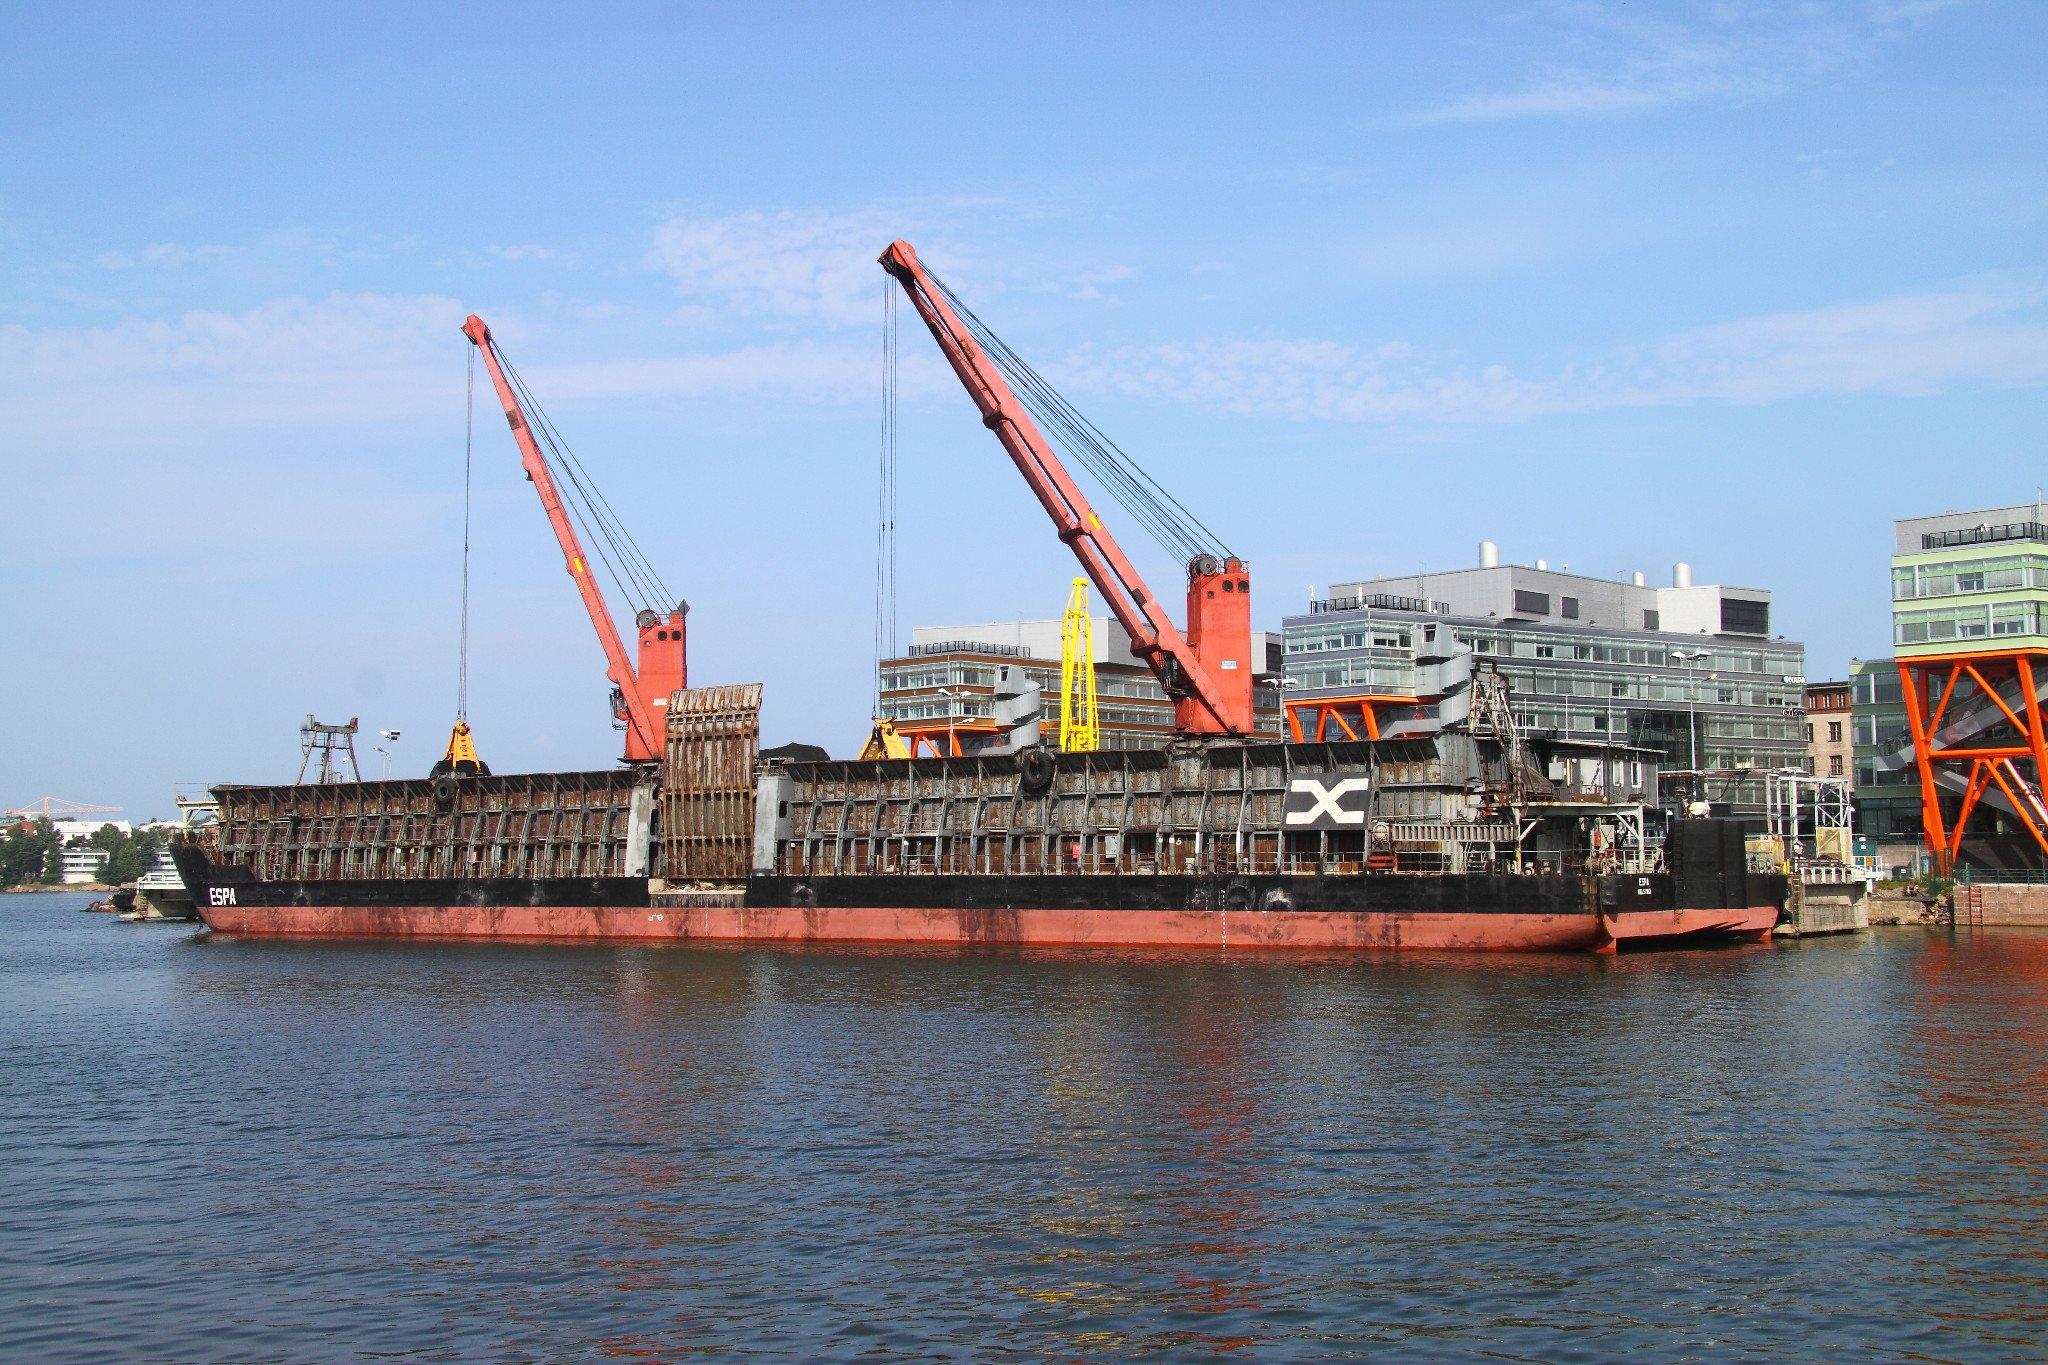 Barge Espa